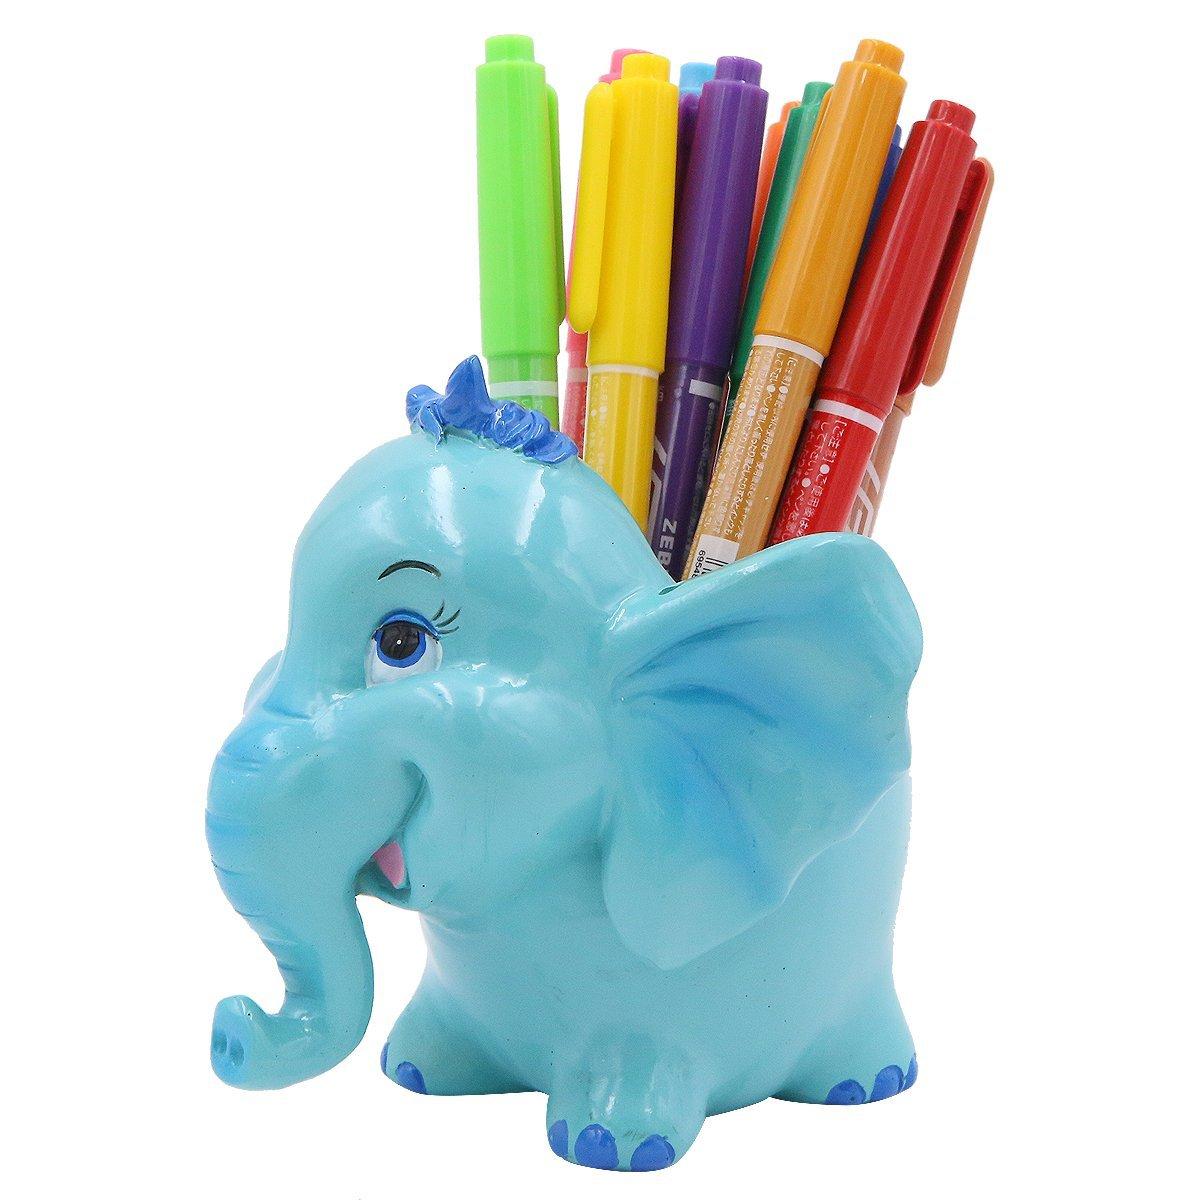 Exquisite Cute Resin Animal Pen Pencil Holder Storage Box Desk Organizer Accessories (Elephant)